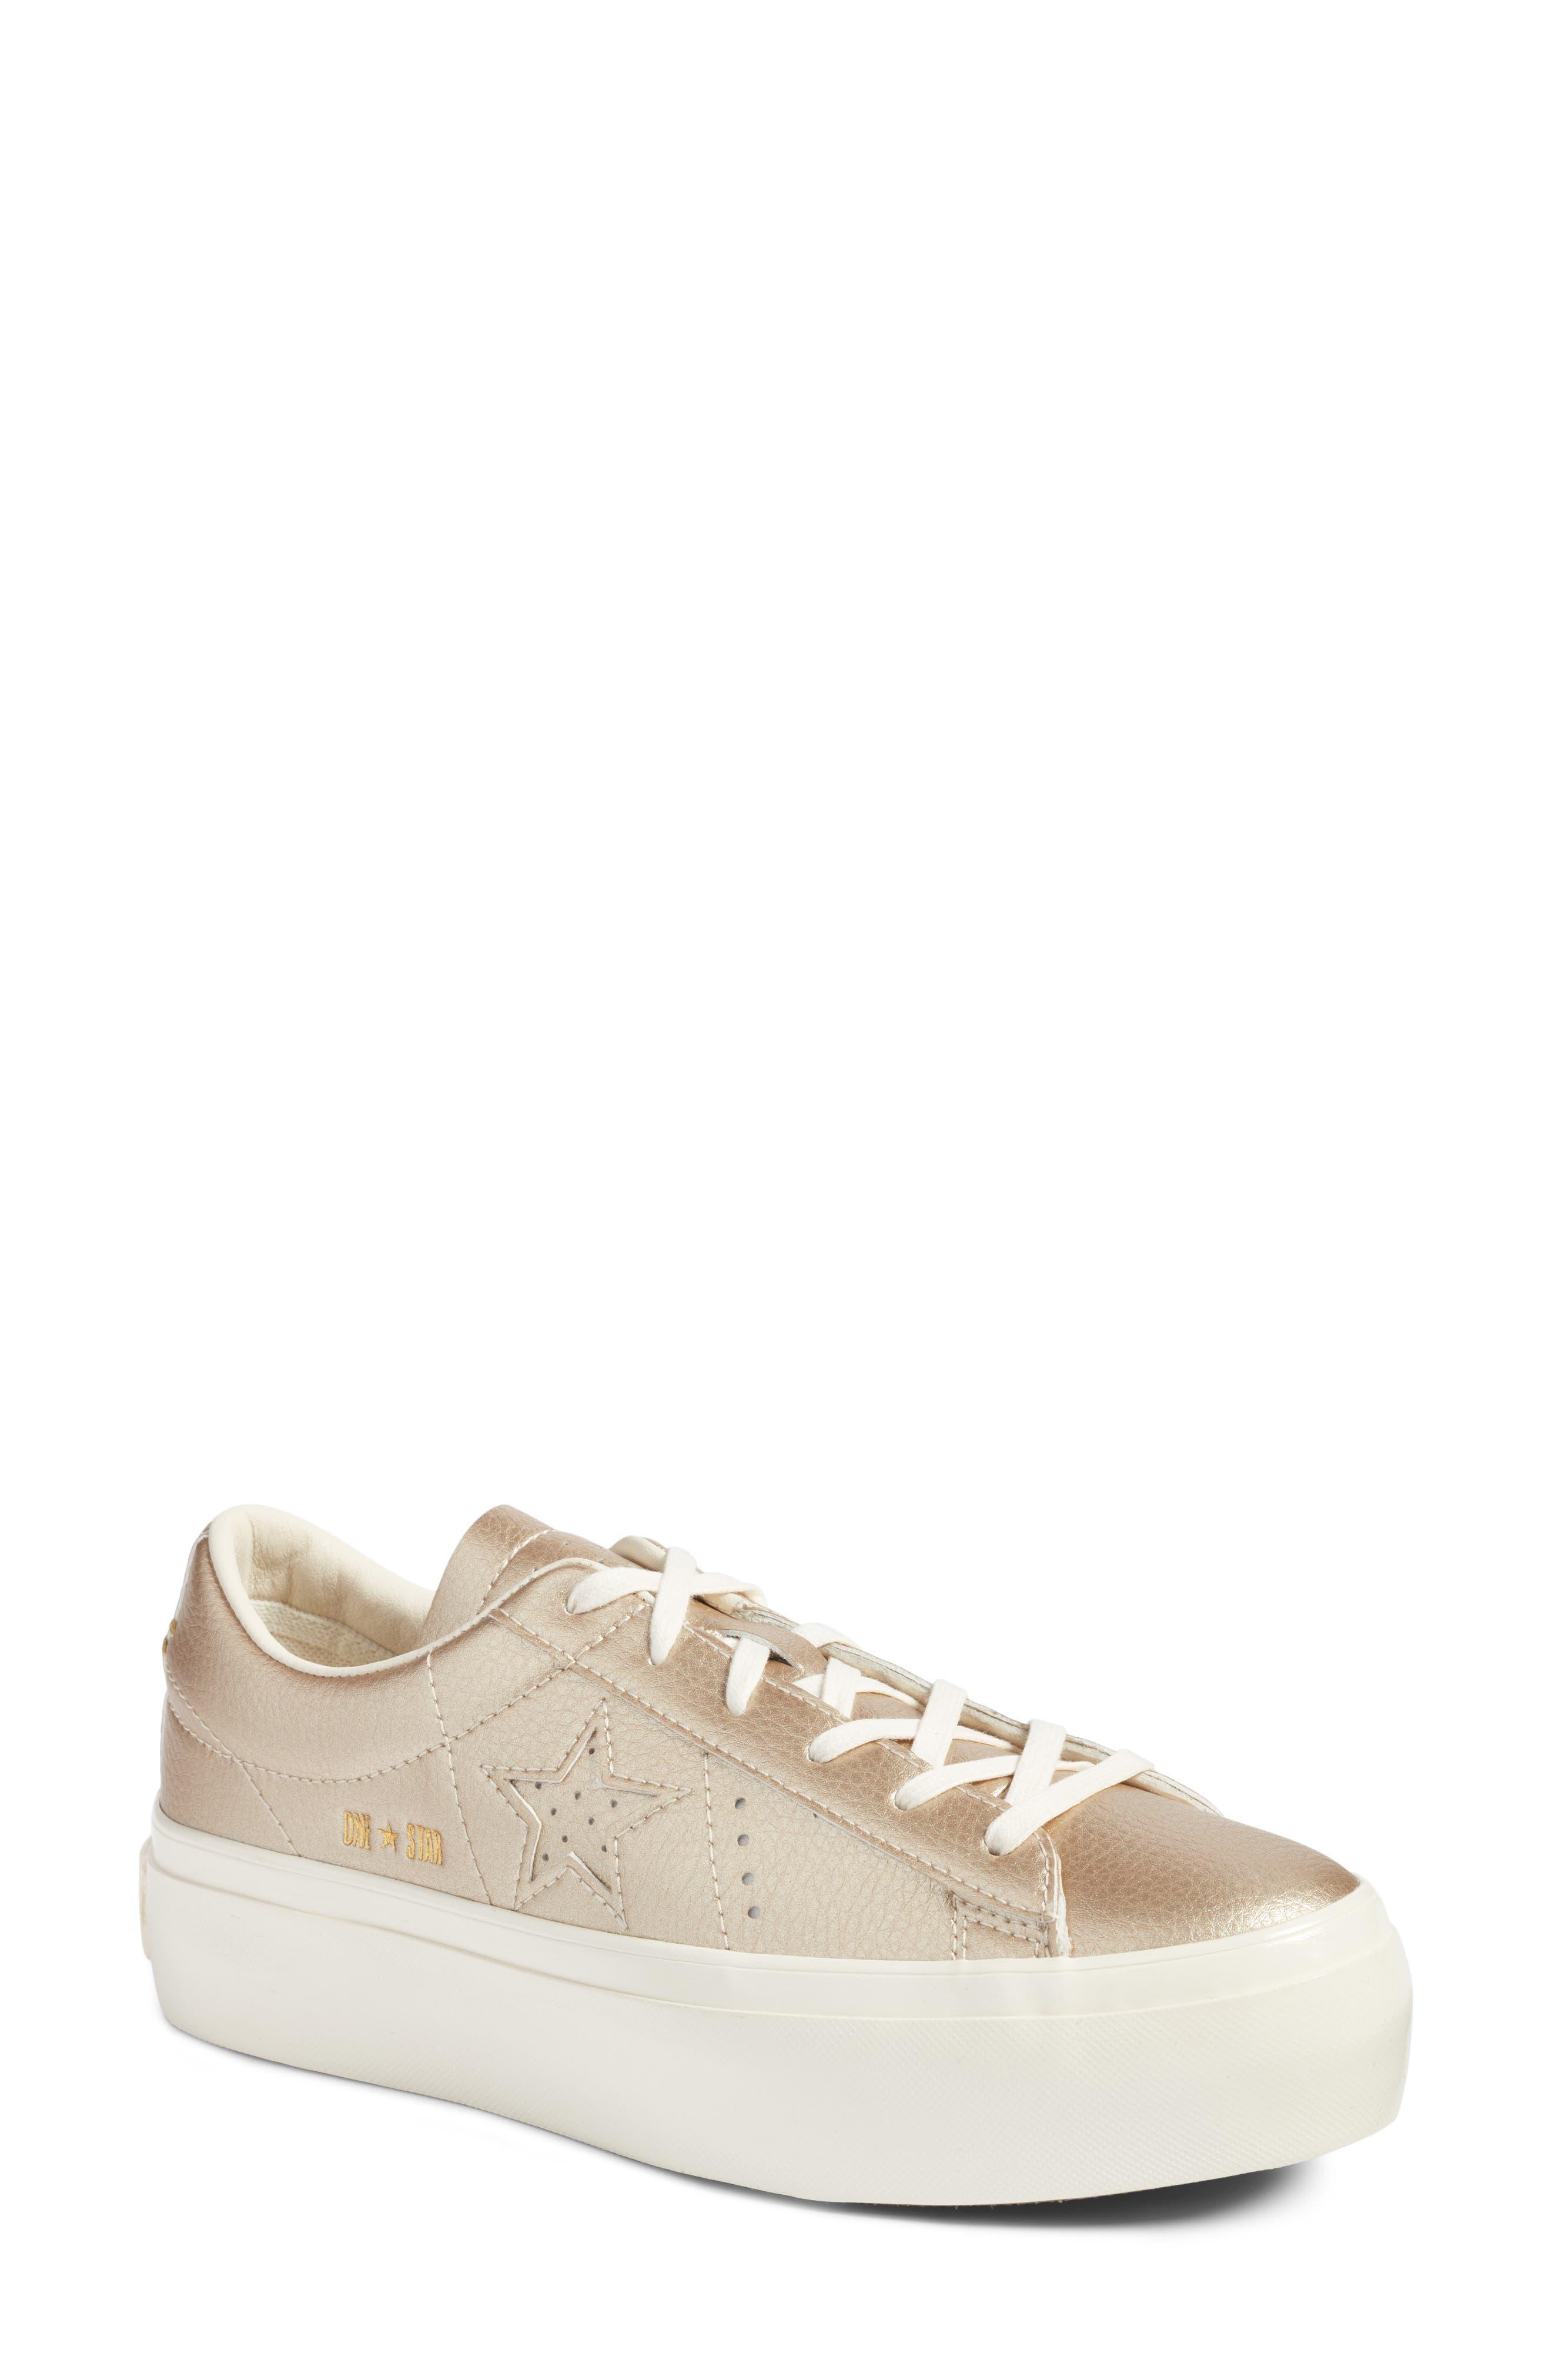 Chuck Taylor<sup>®</sup> All Star<sup>®</sup> One Star Metallic Platform Sneaker,                             Main thumbnail 1, color,